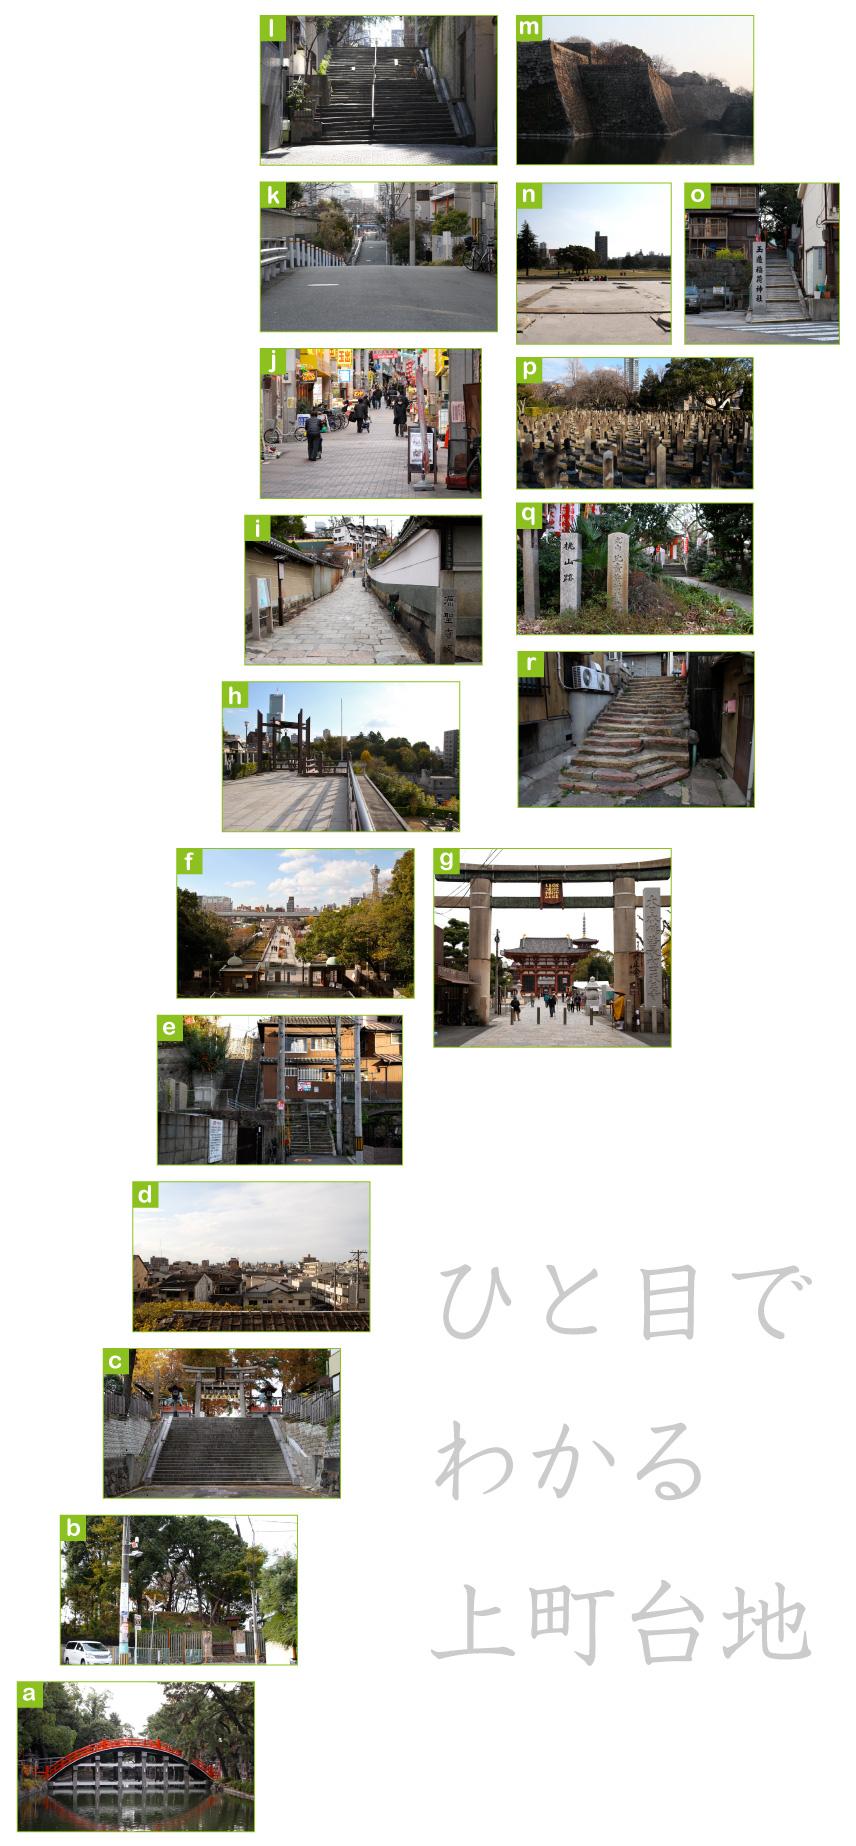 daichi_point_03.jpg